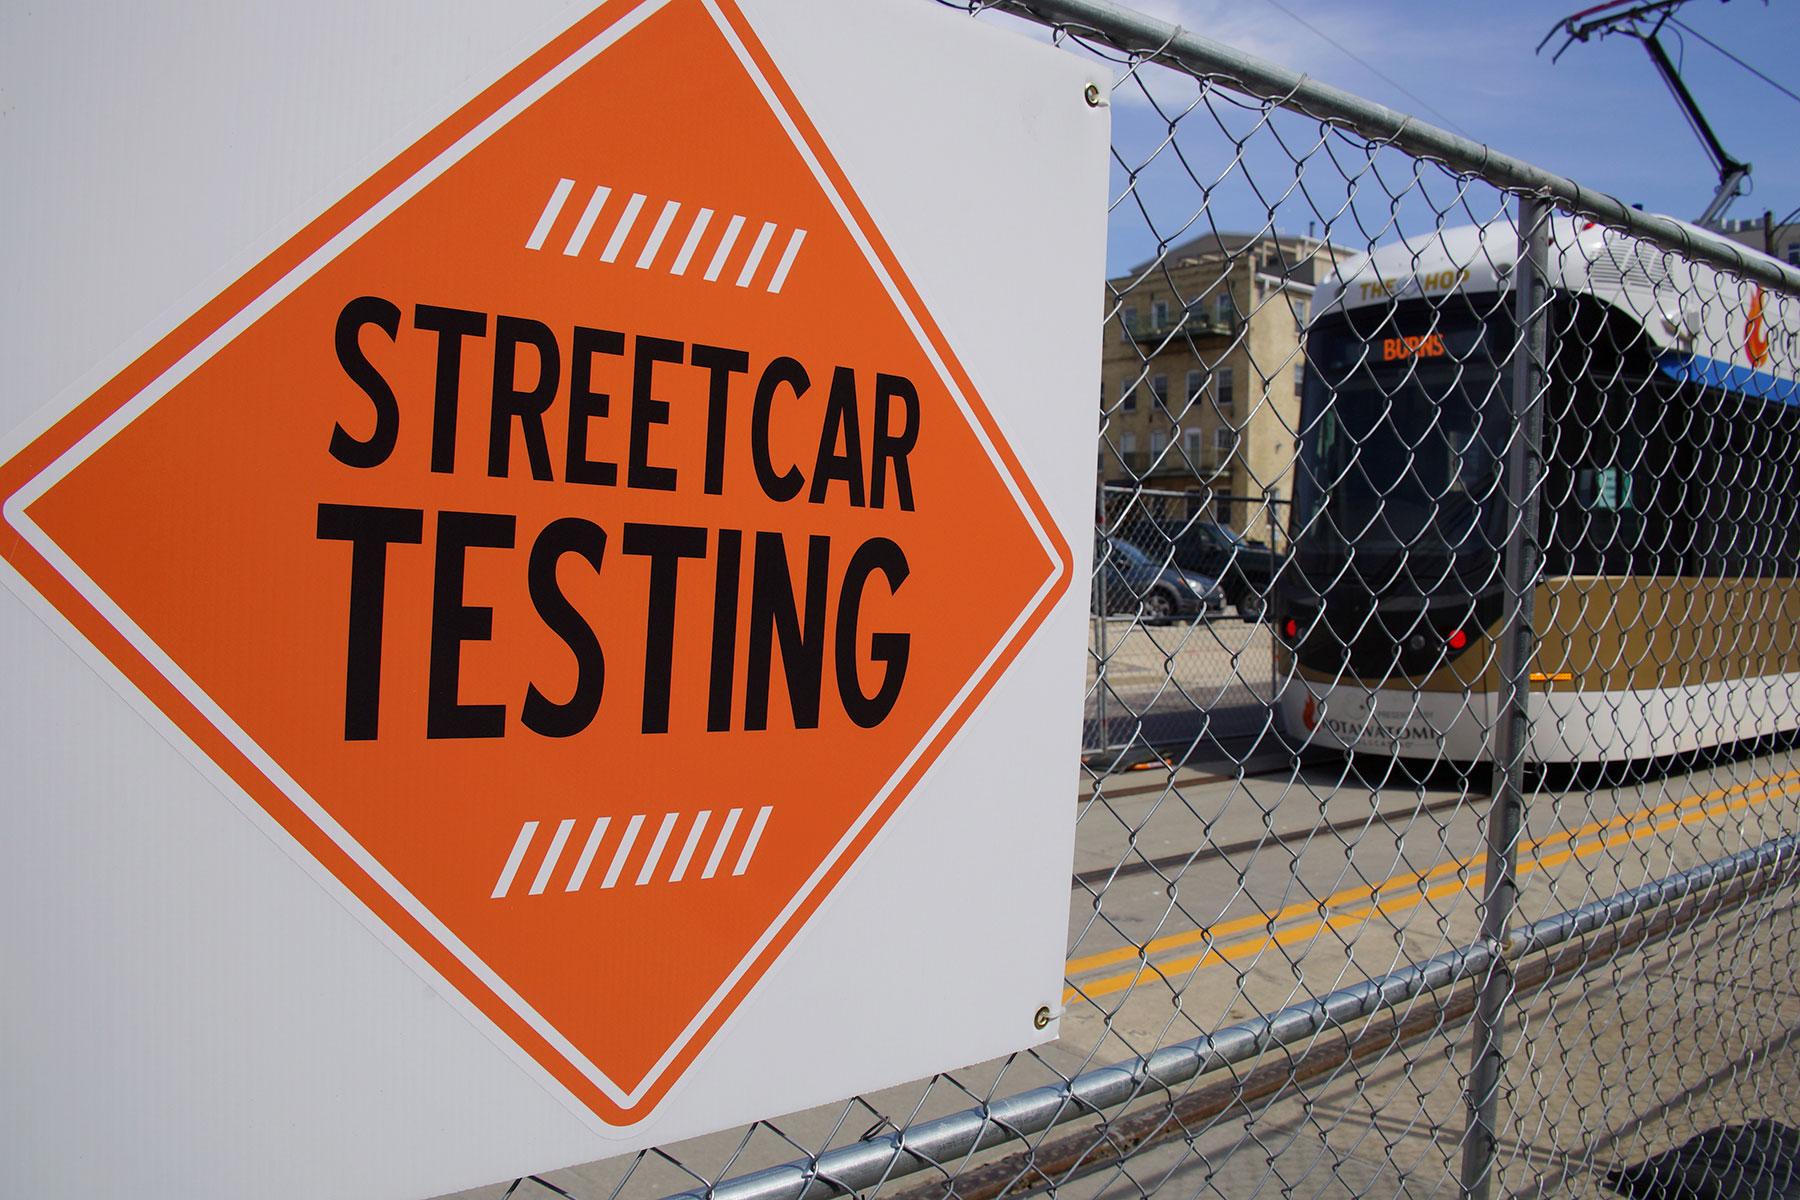 041118_streetcartesting_209